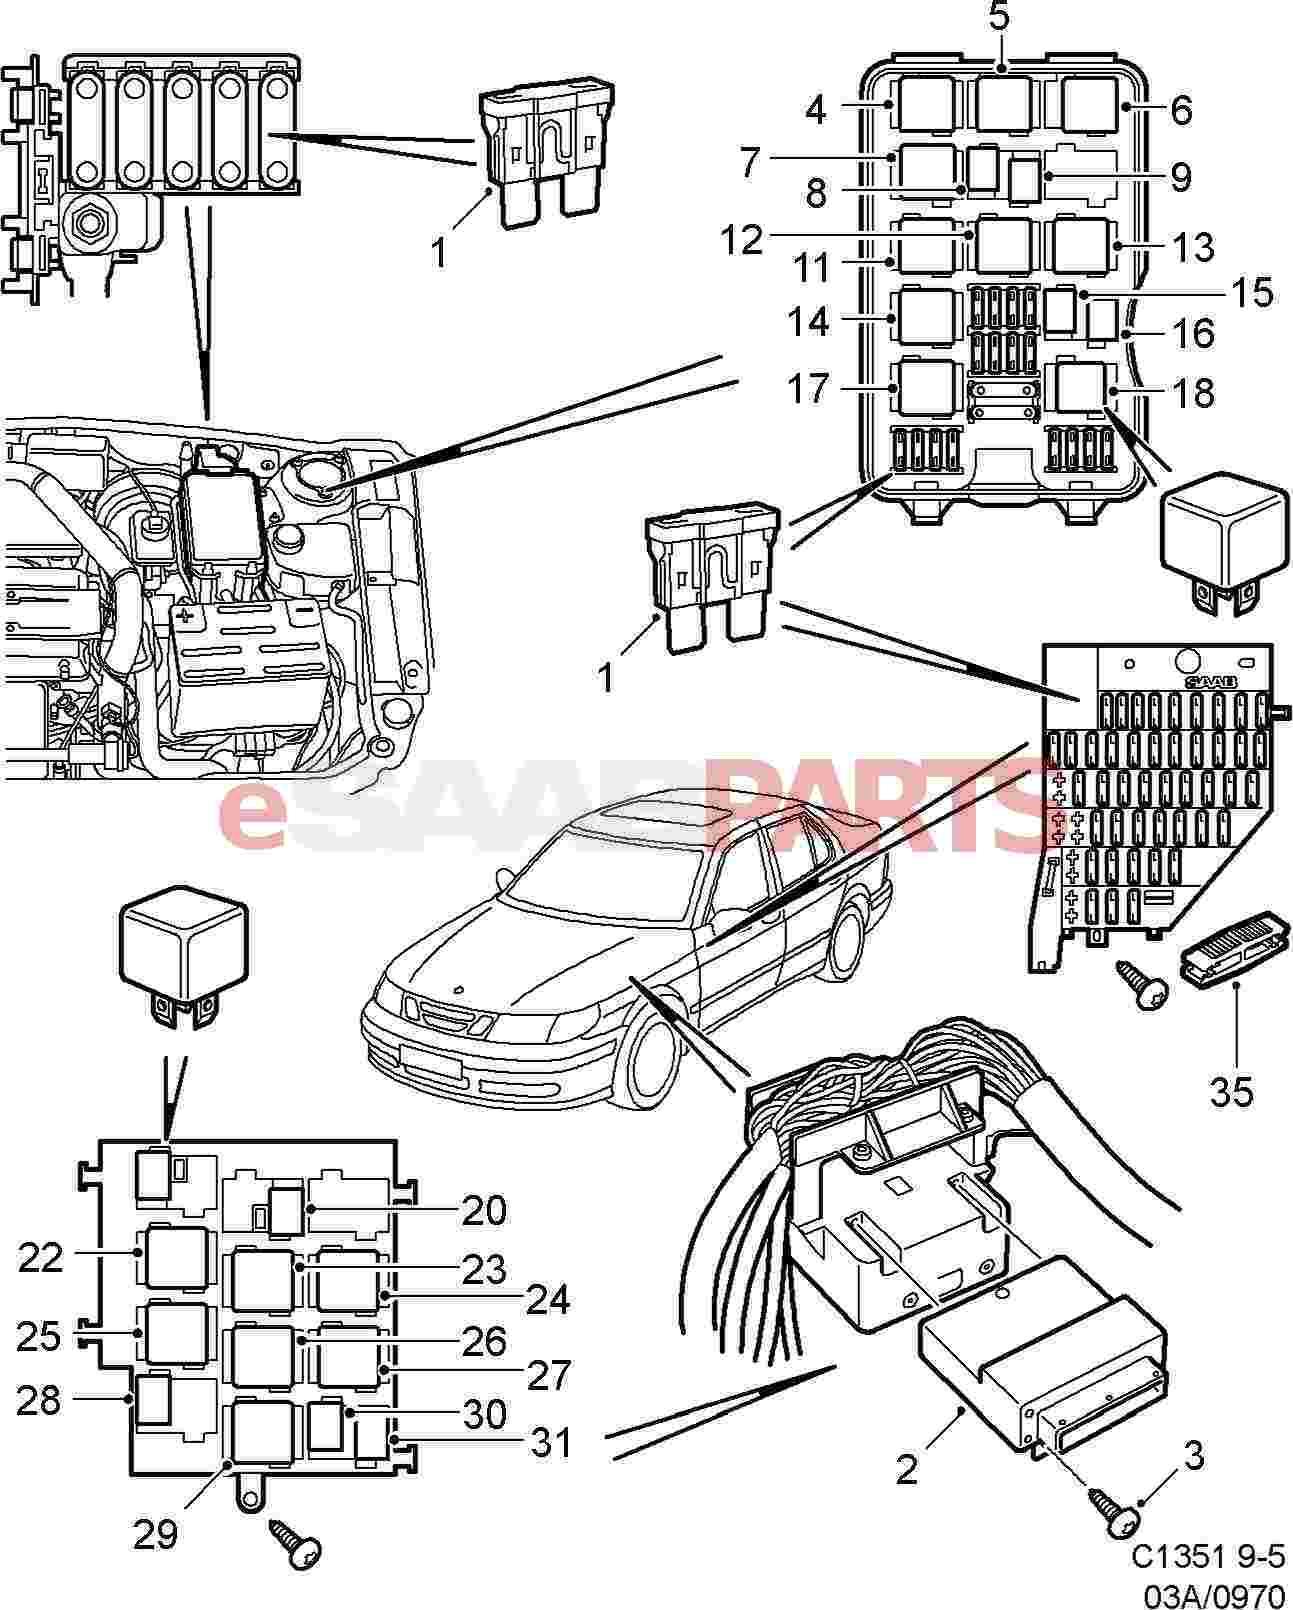 volvo xc90 fuse box layout